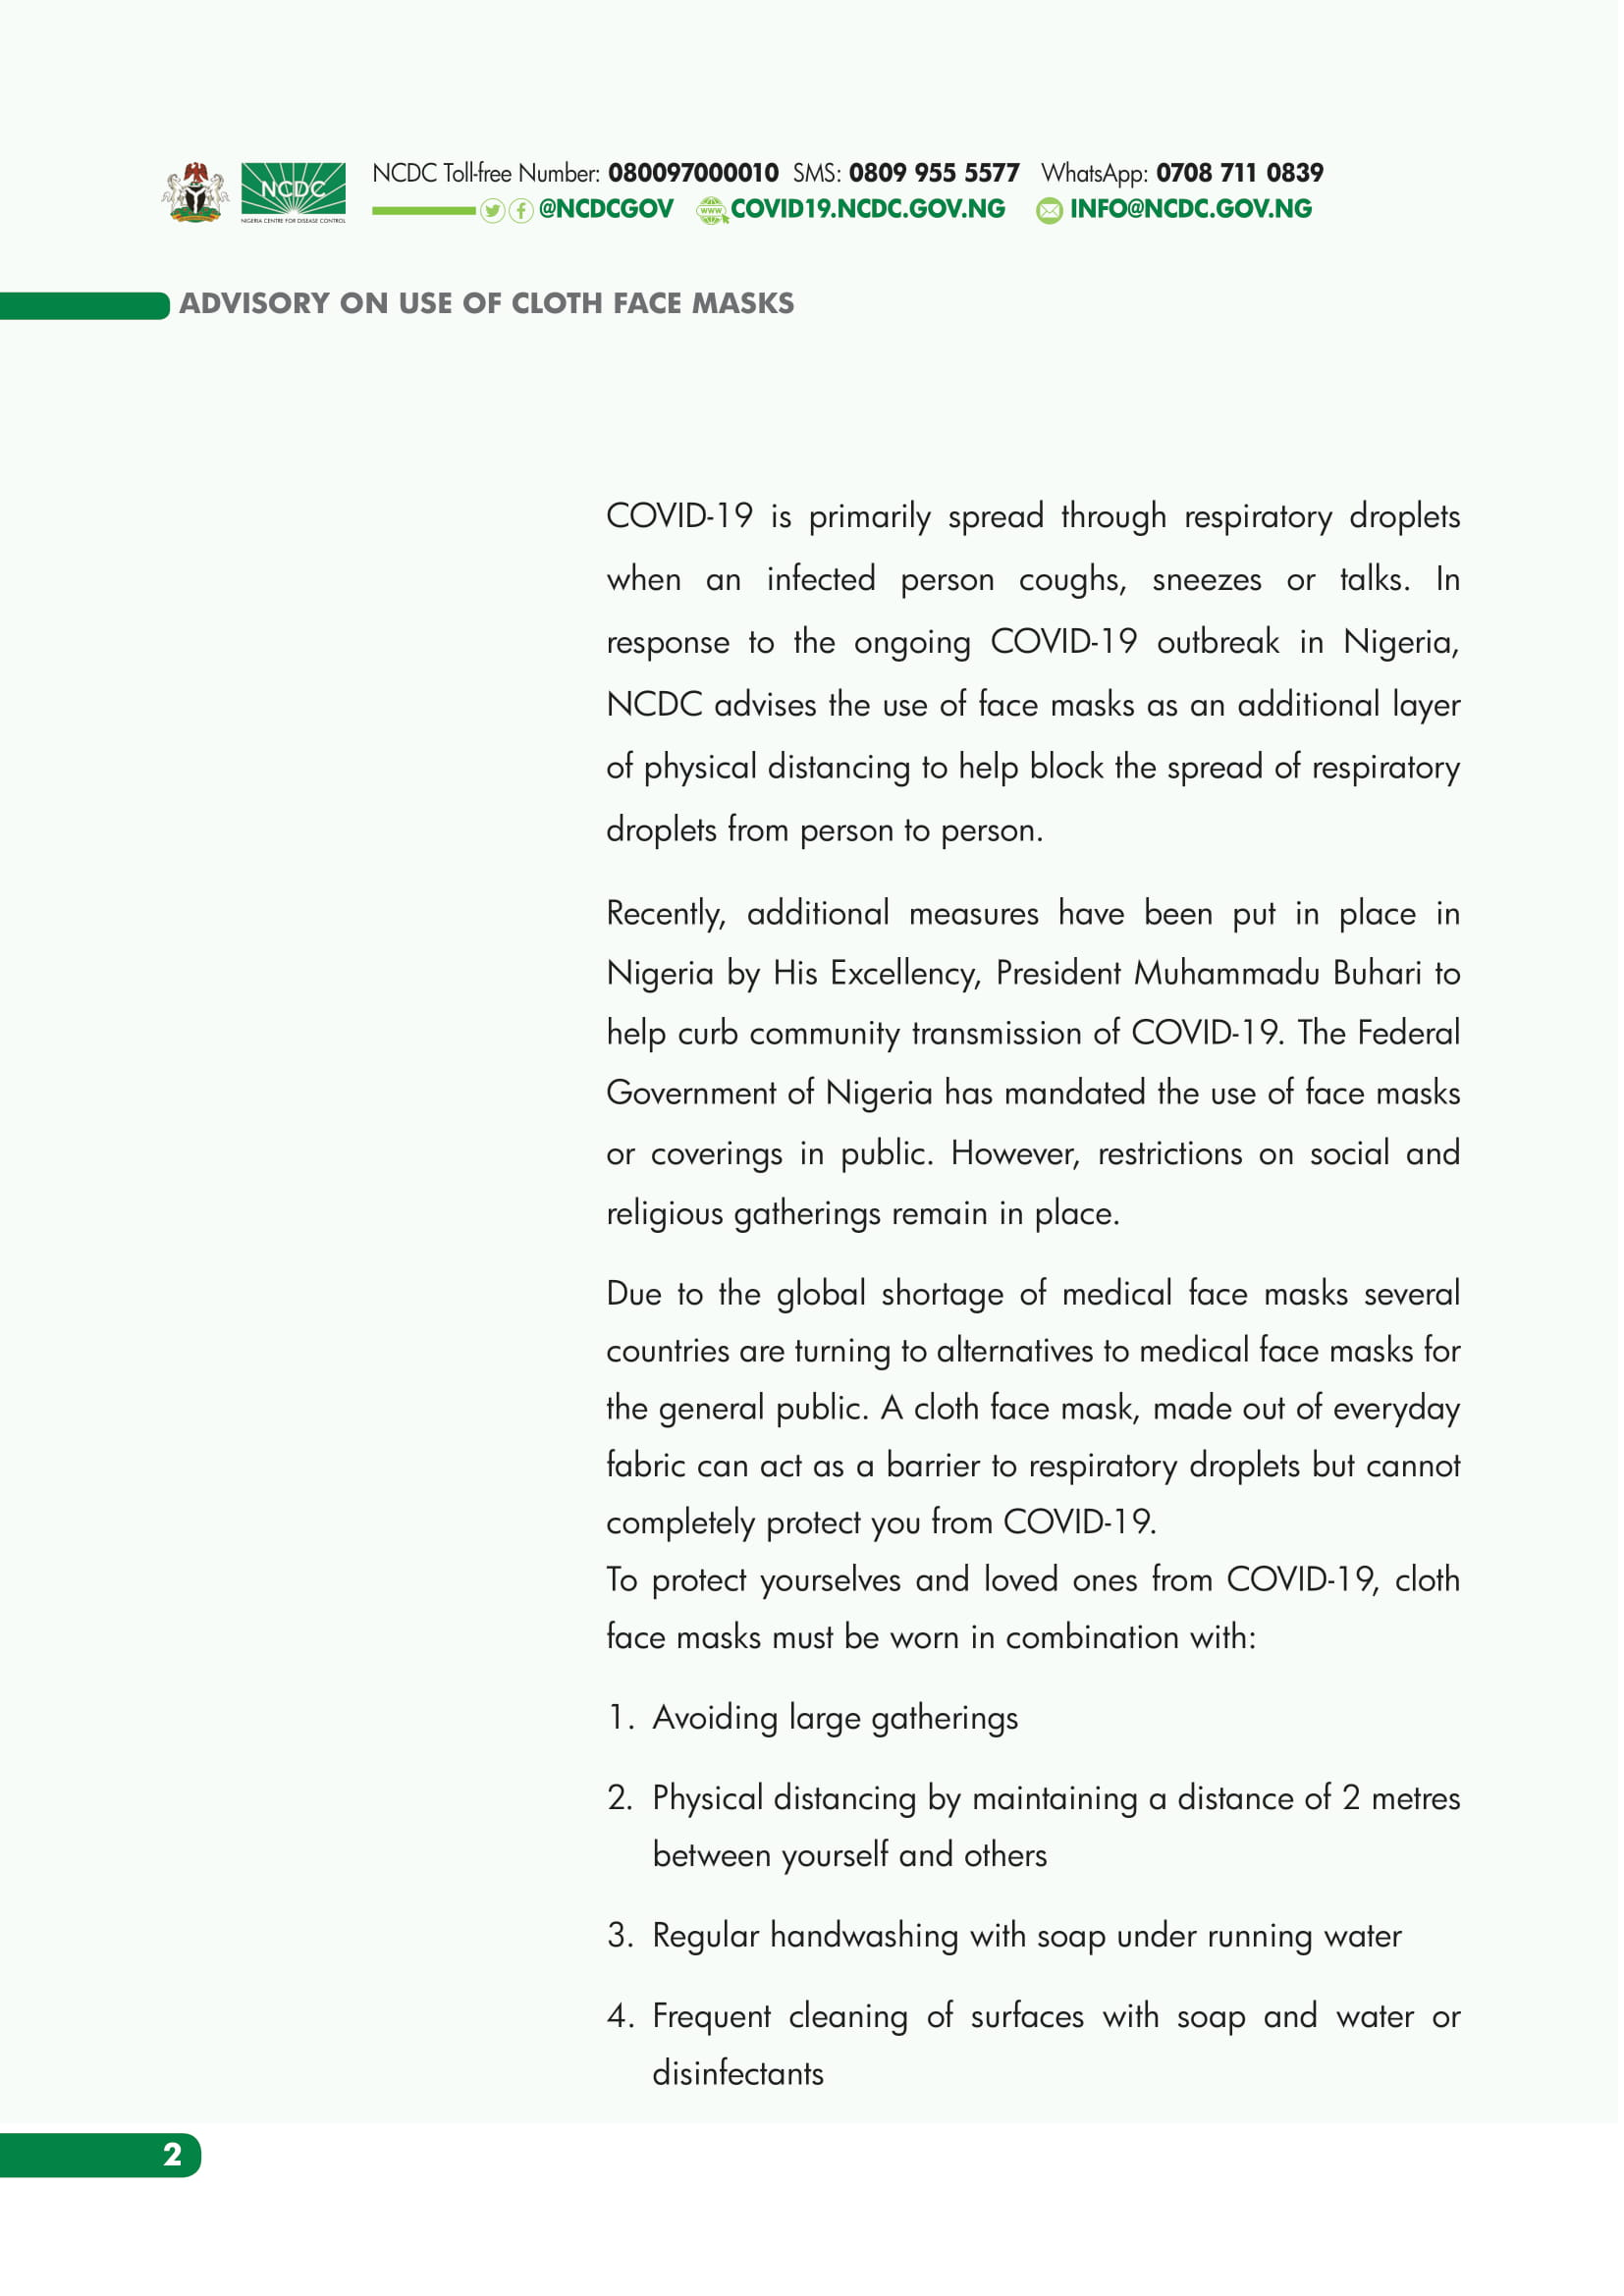 cloth-face-mask-nigeria-ncdc-guidelines-use-toyin-lawani-covid-19-coronavirus